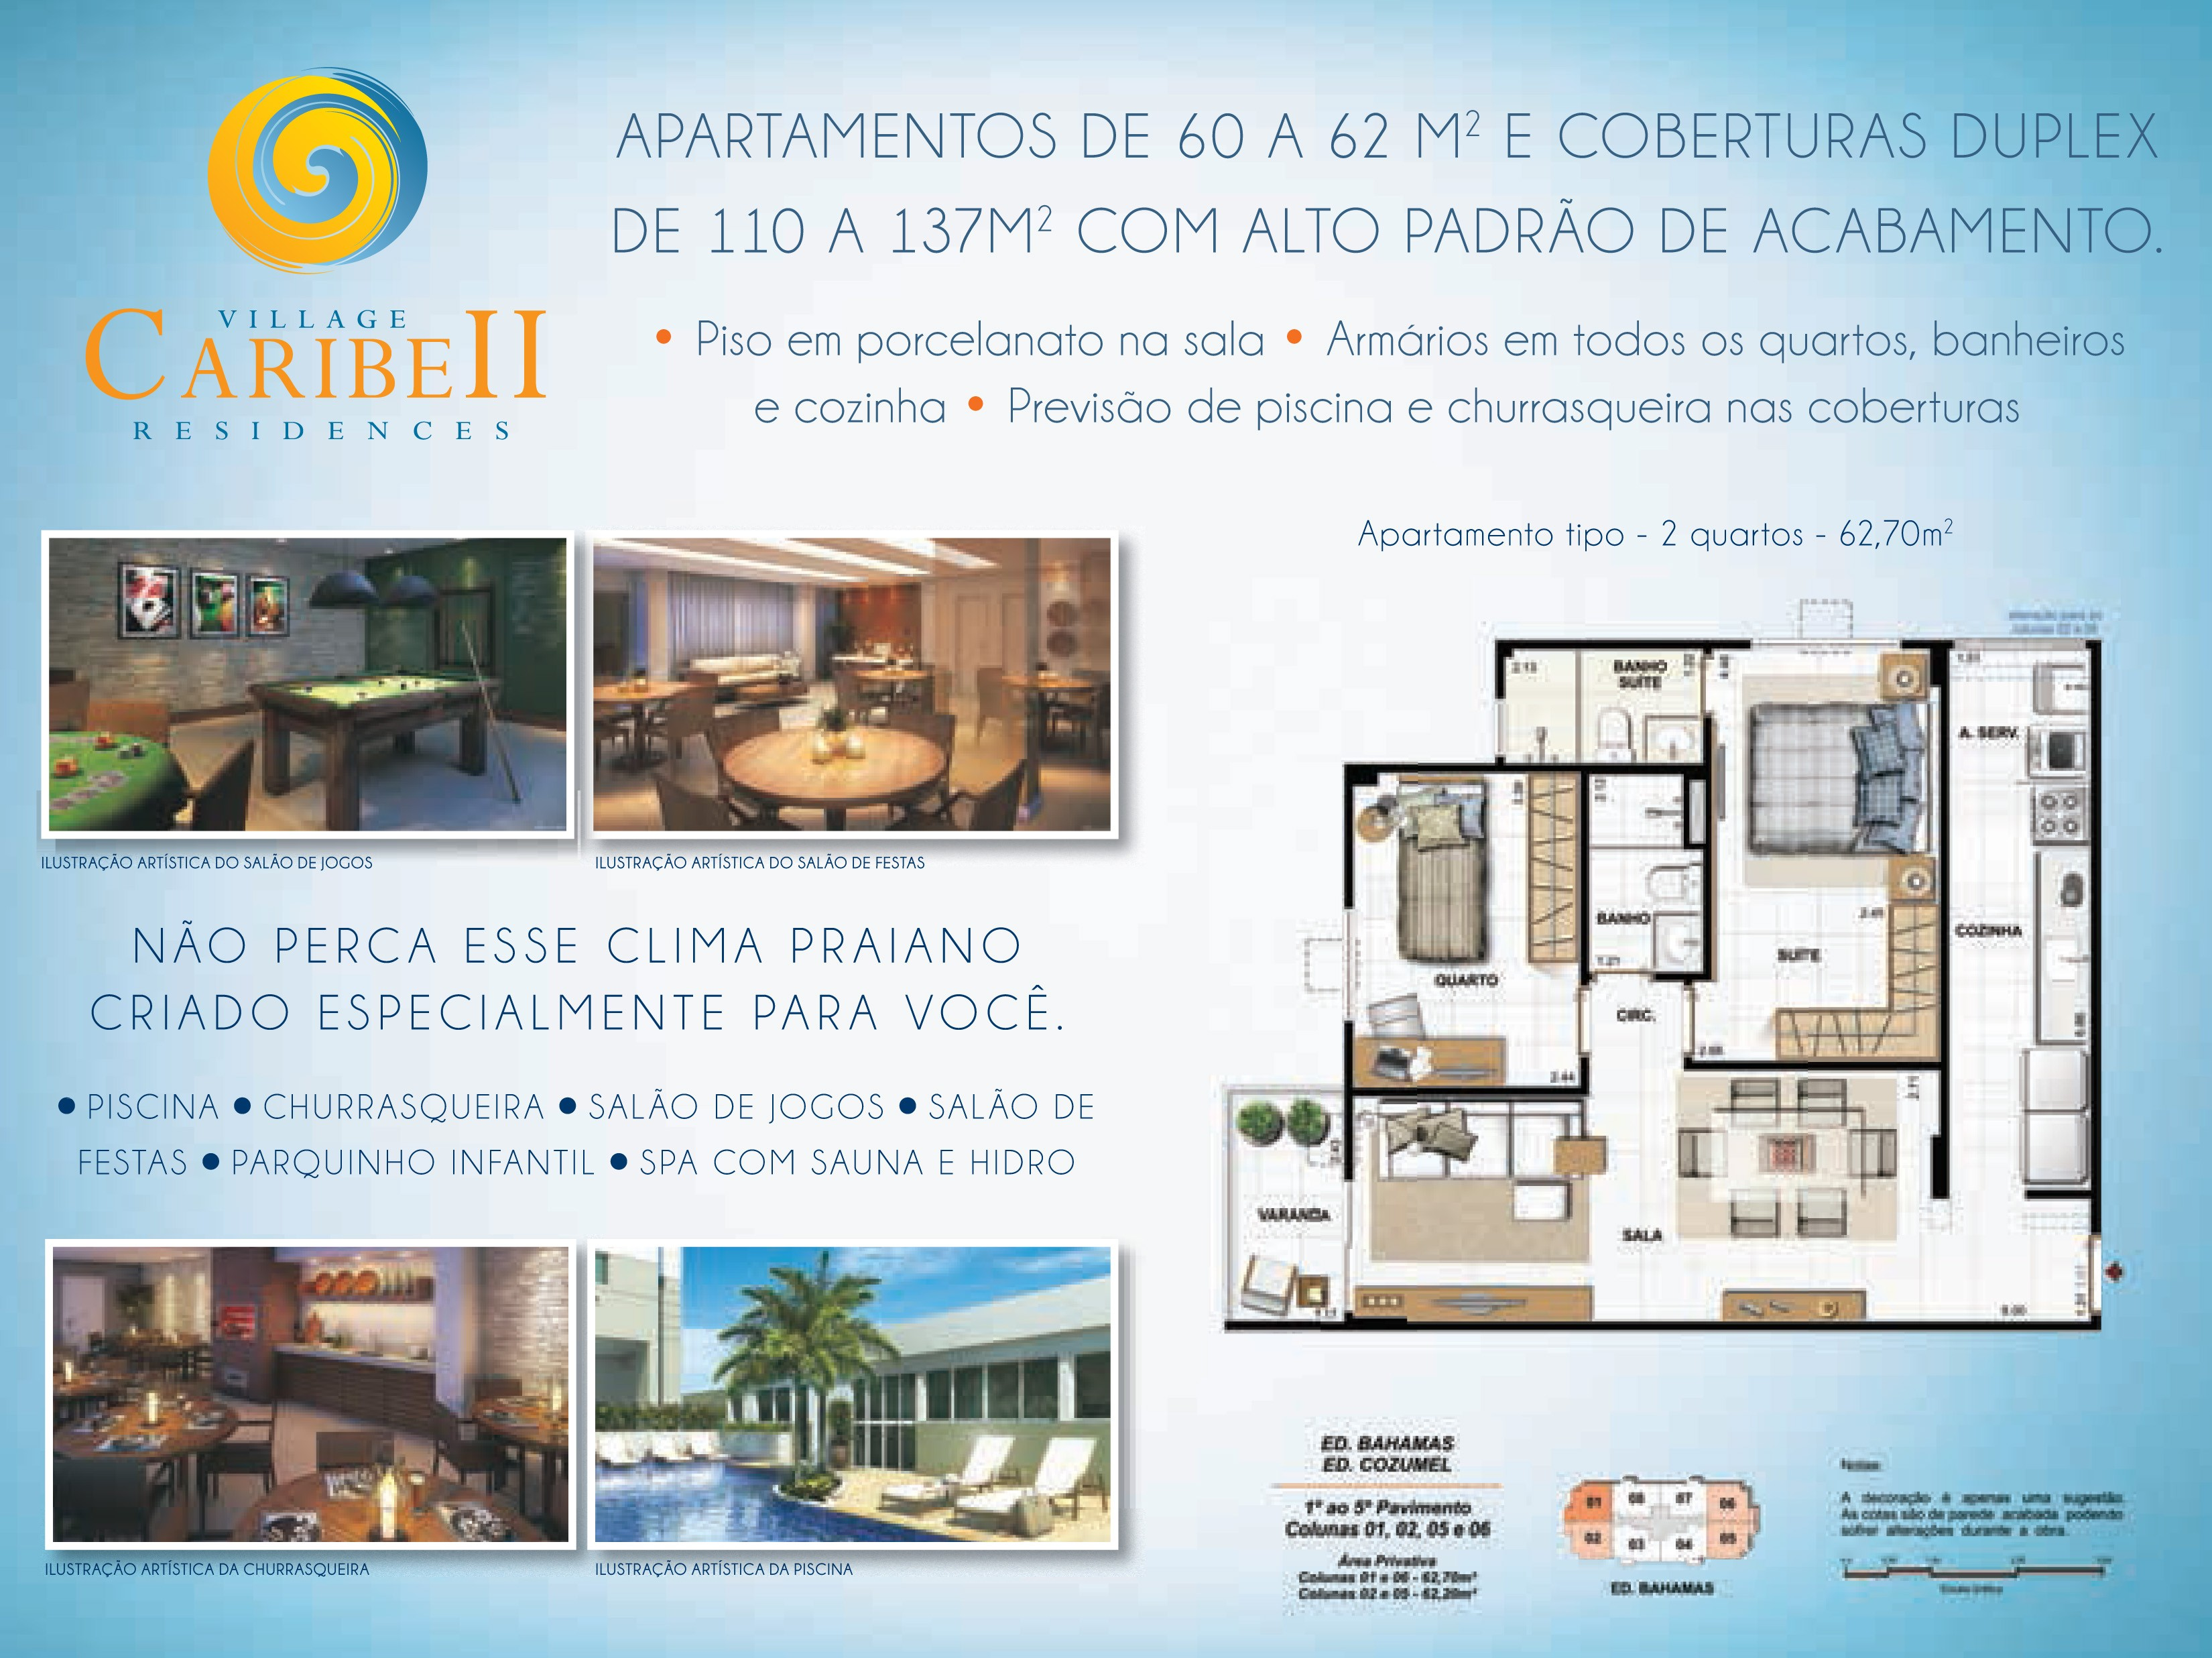 Santinho Village Caribe Residences 2 - Verso